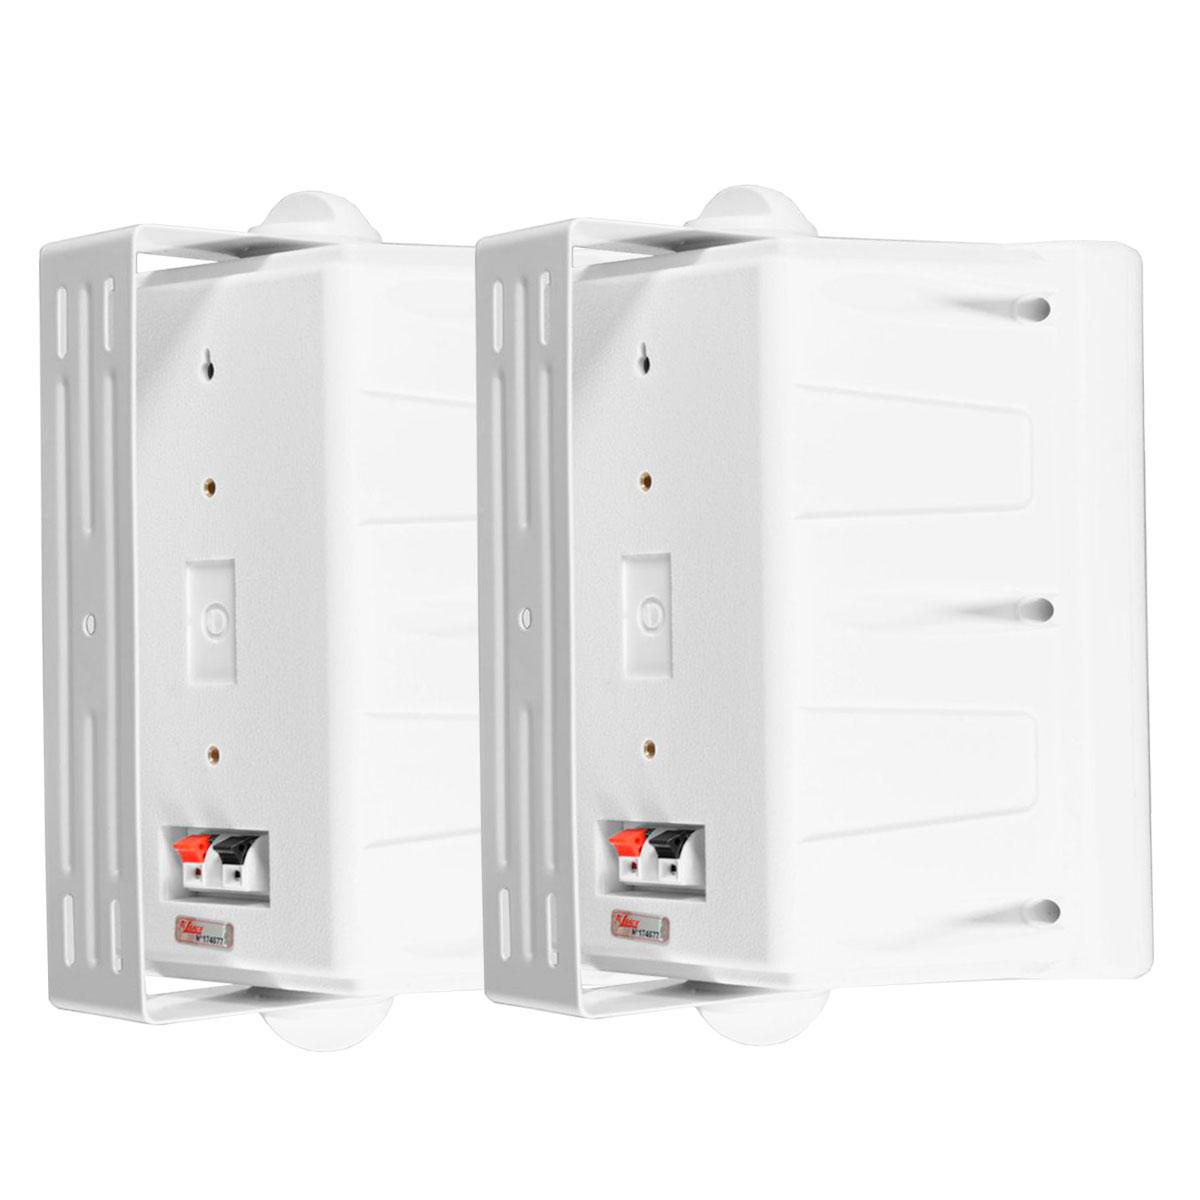 IT65 - Caixa Passiva 75W Branca c/ Suporte ( Par ) IT 65 - Leacs